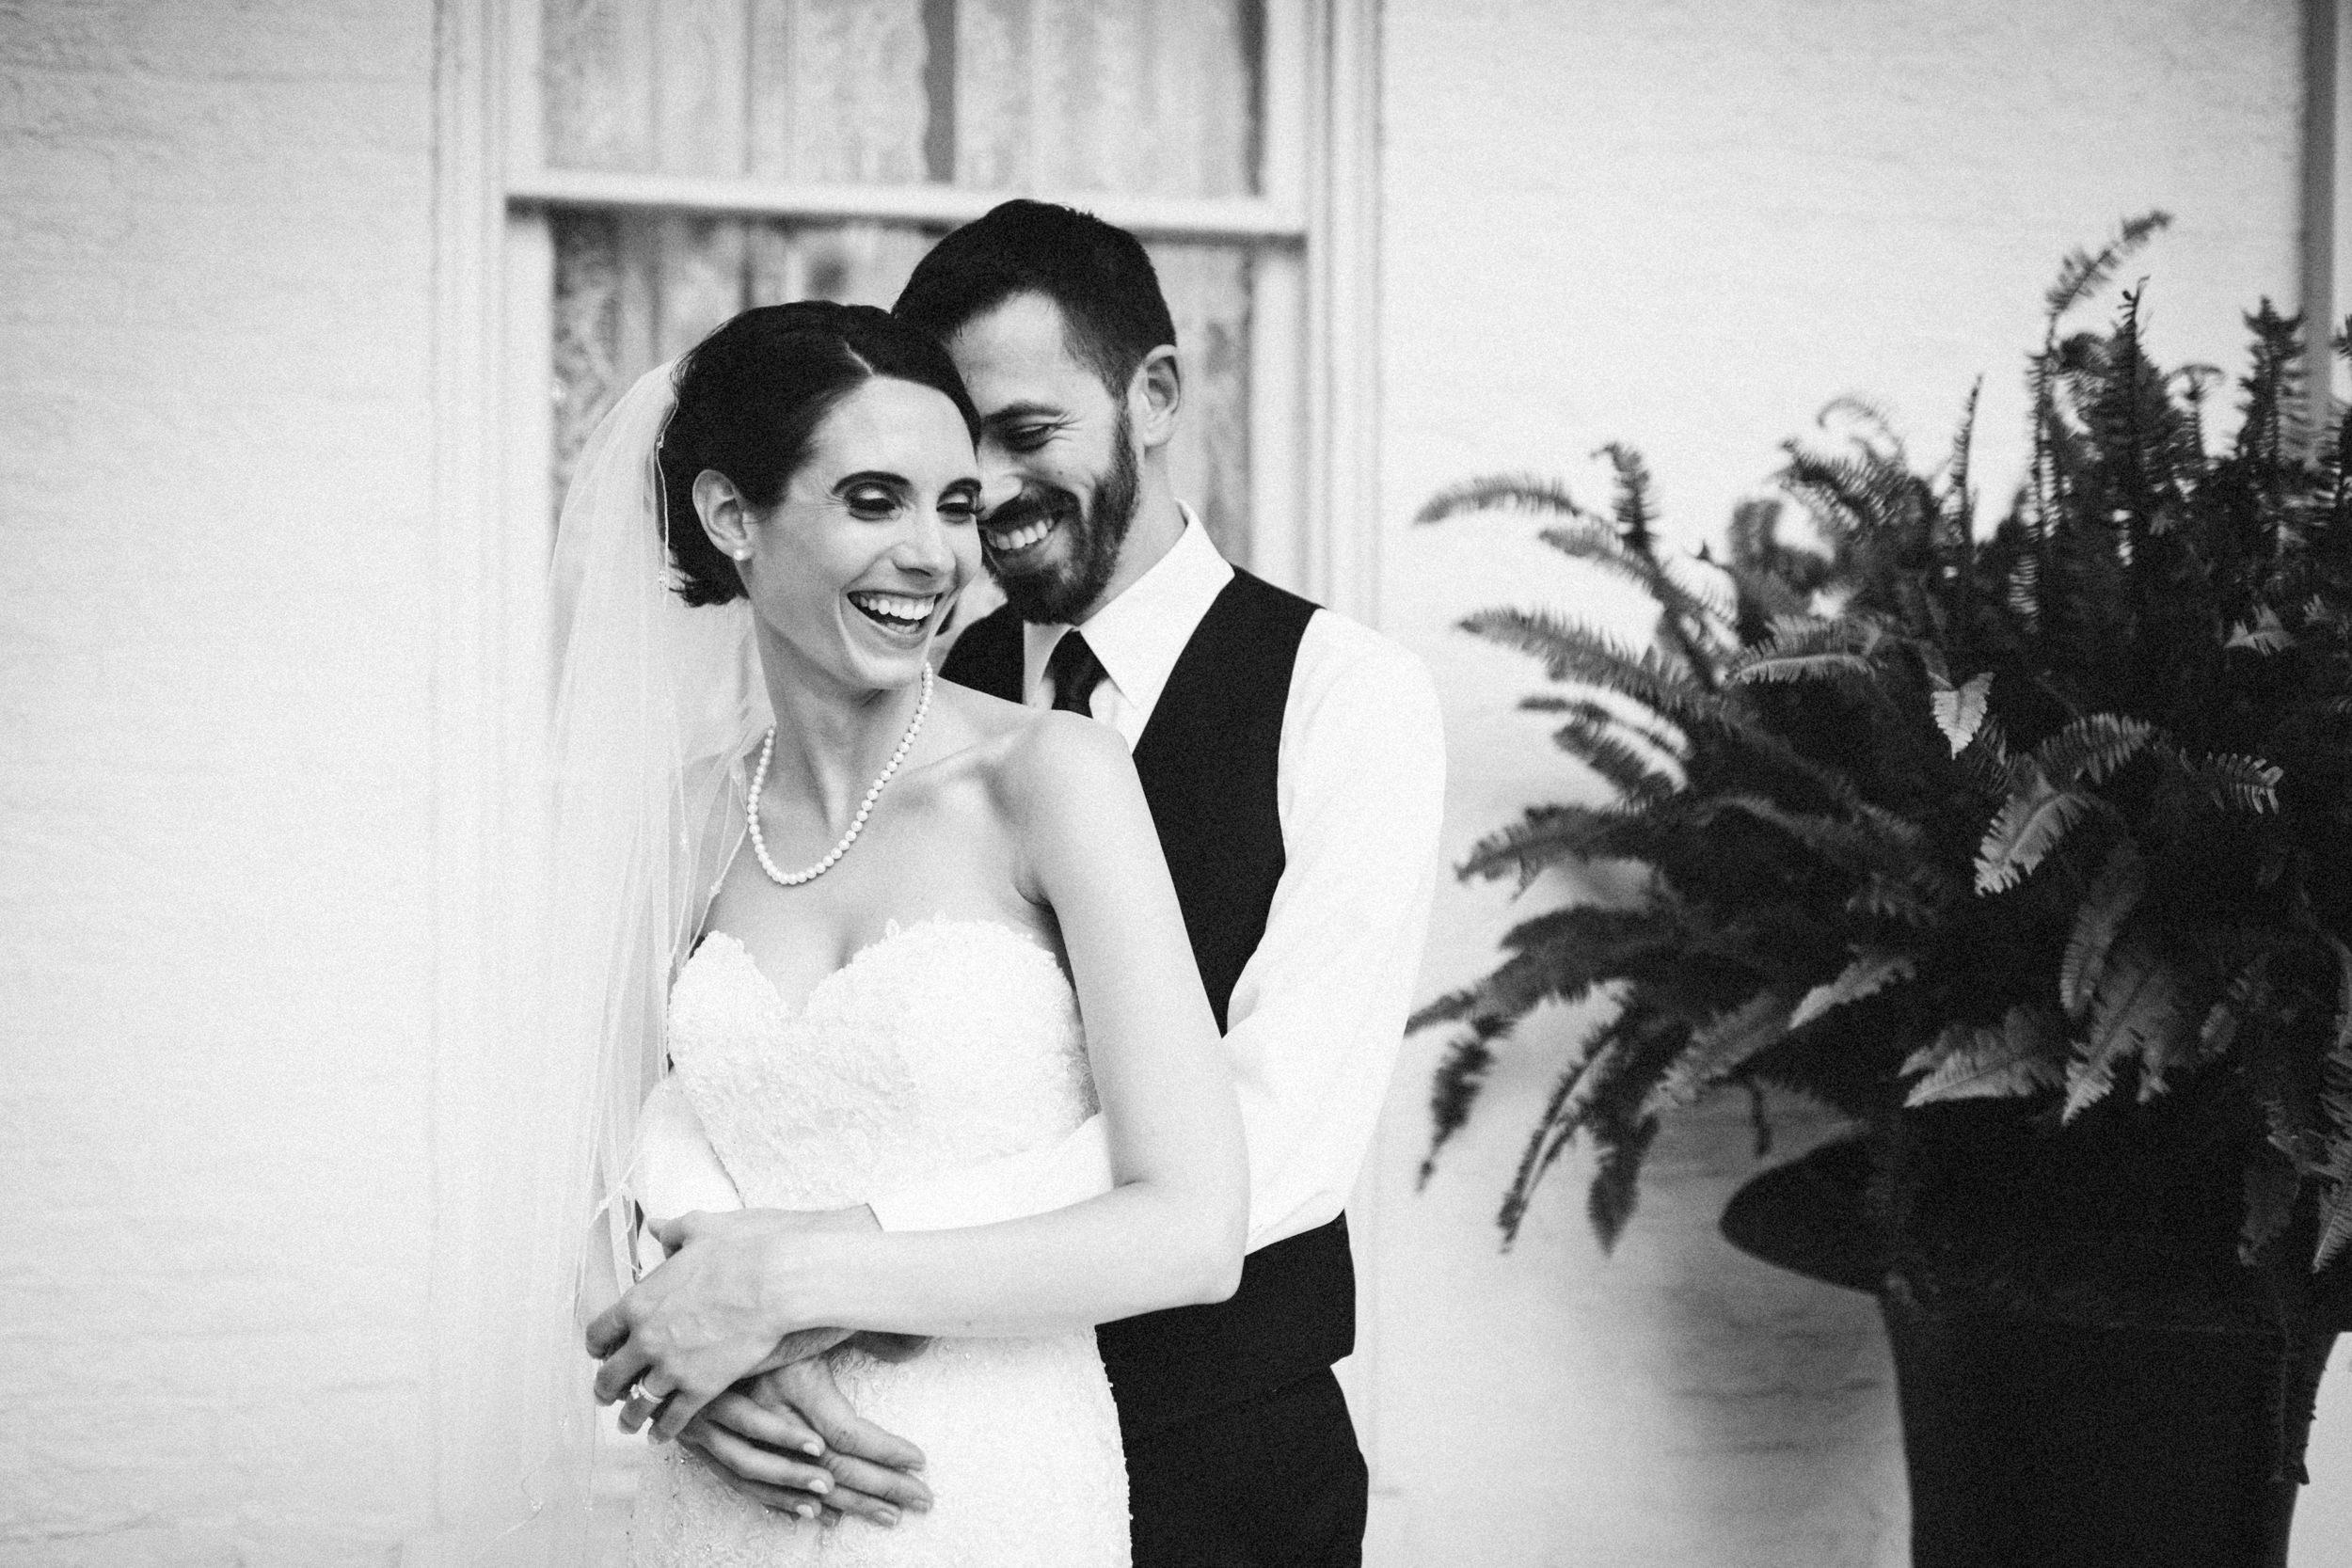 Louisville-Kentucky-Wedding-Elopement-Photographer-Sarah-Katherine-Davis-Photography-Whitehall-Classic-Timeless-Garden-Wedding-580.jpg